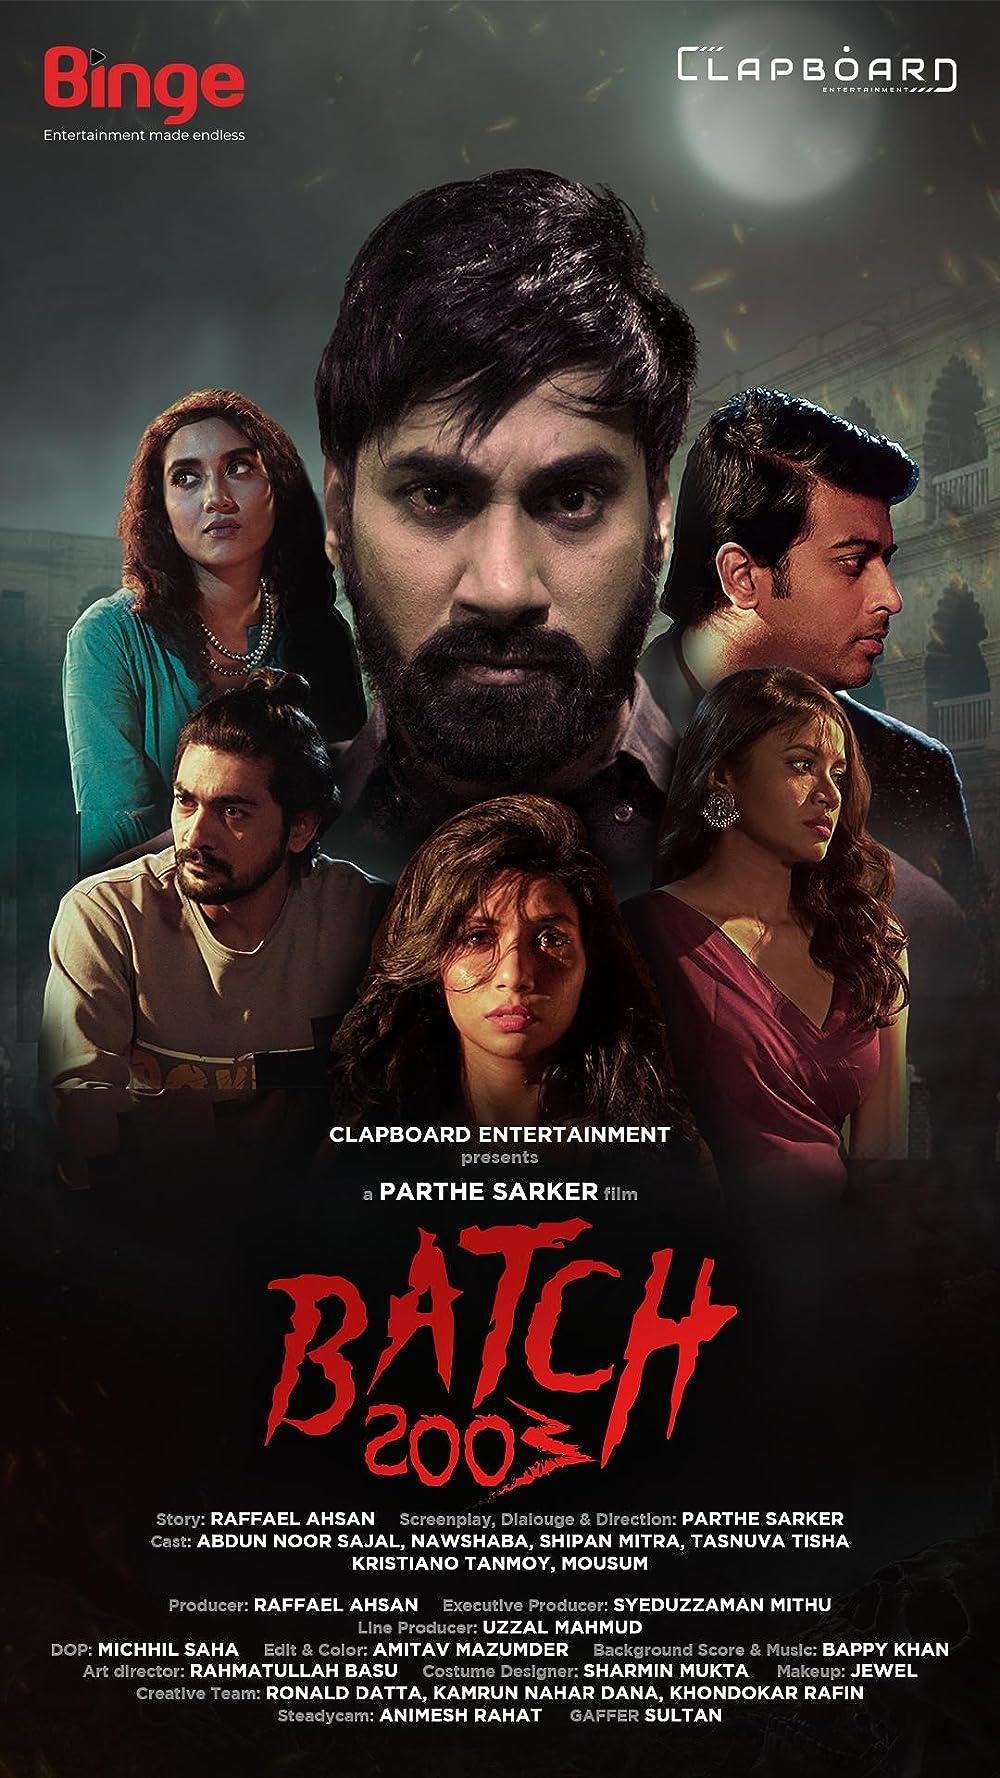 Batch 2003 [2021]